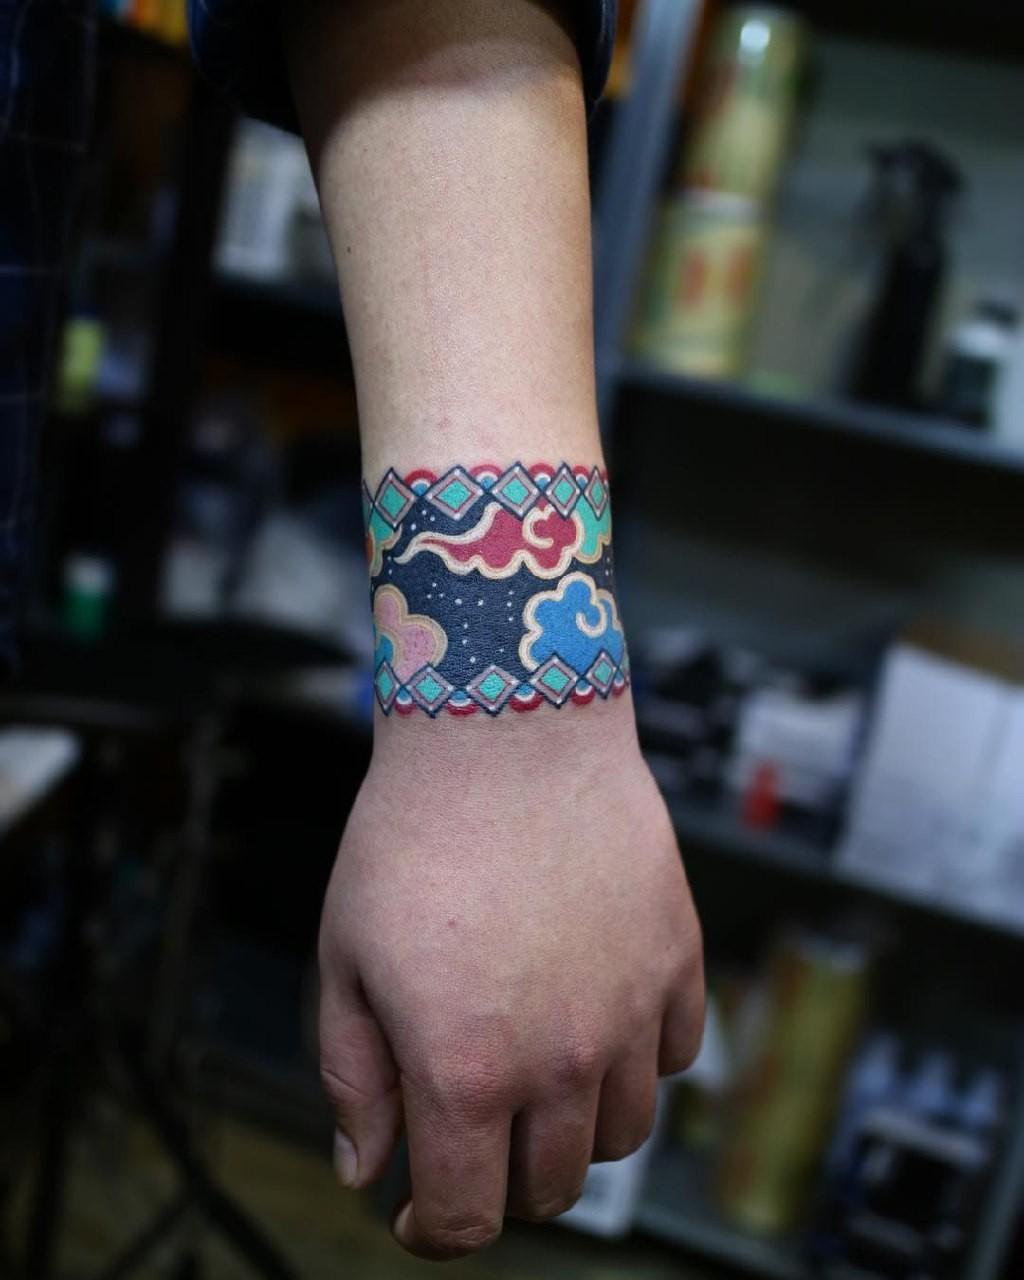 Gratis tatovering dating sites australien